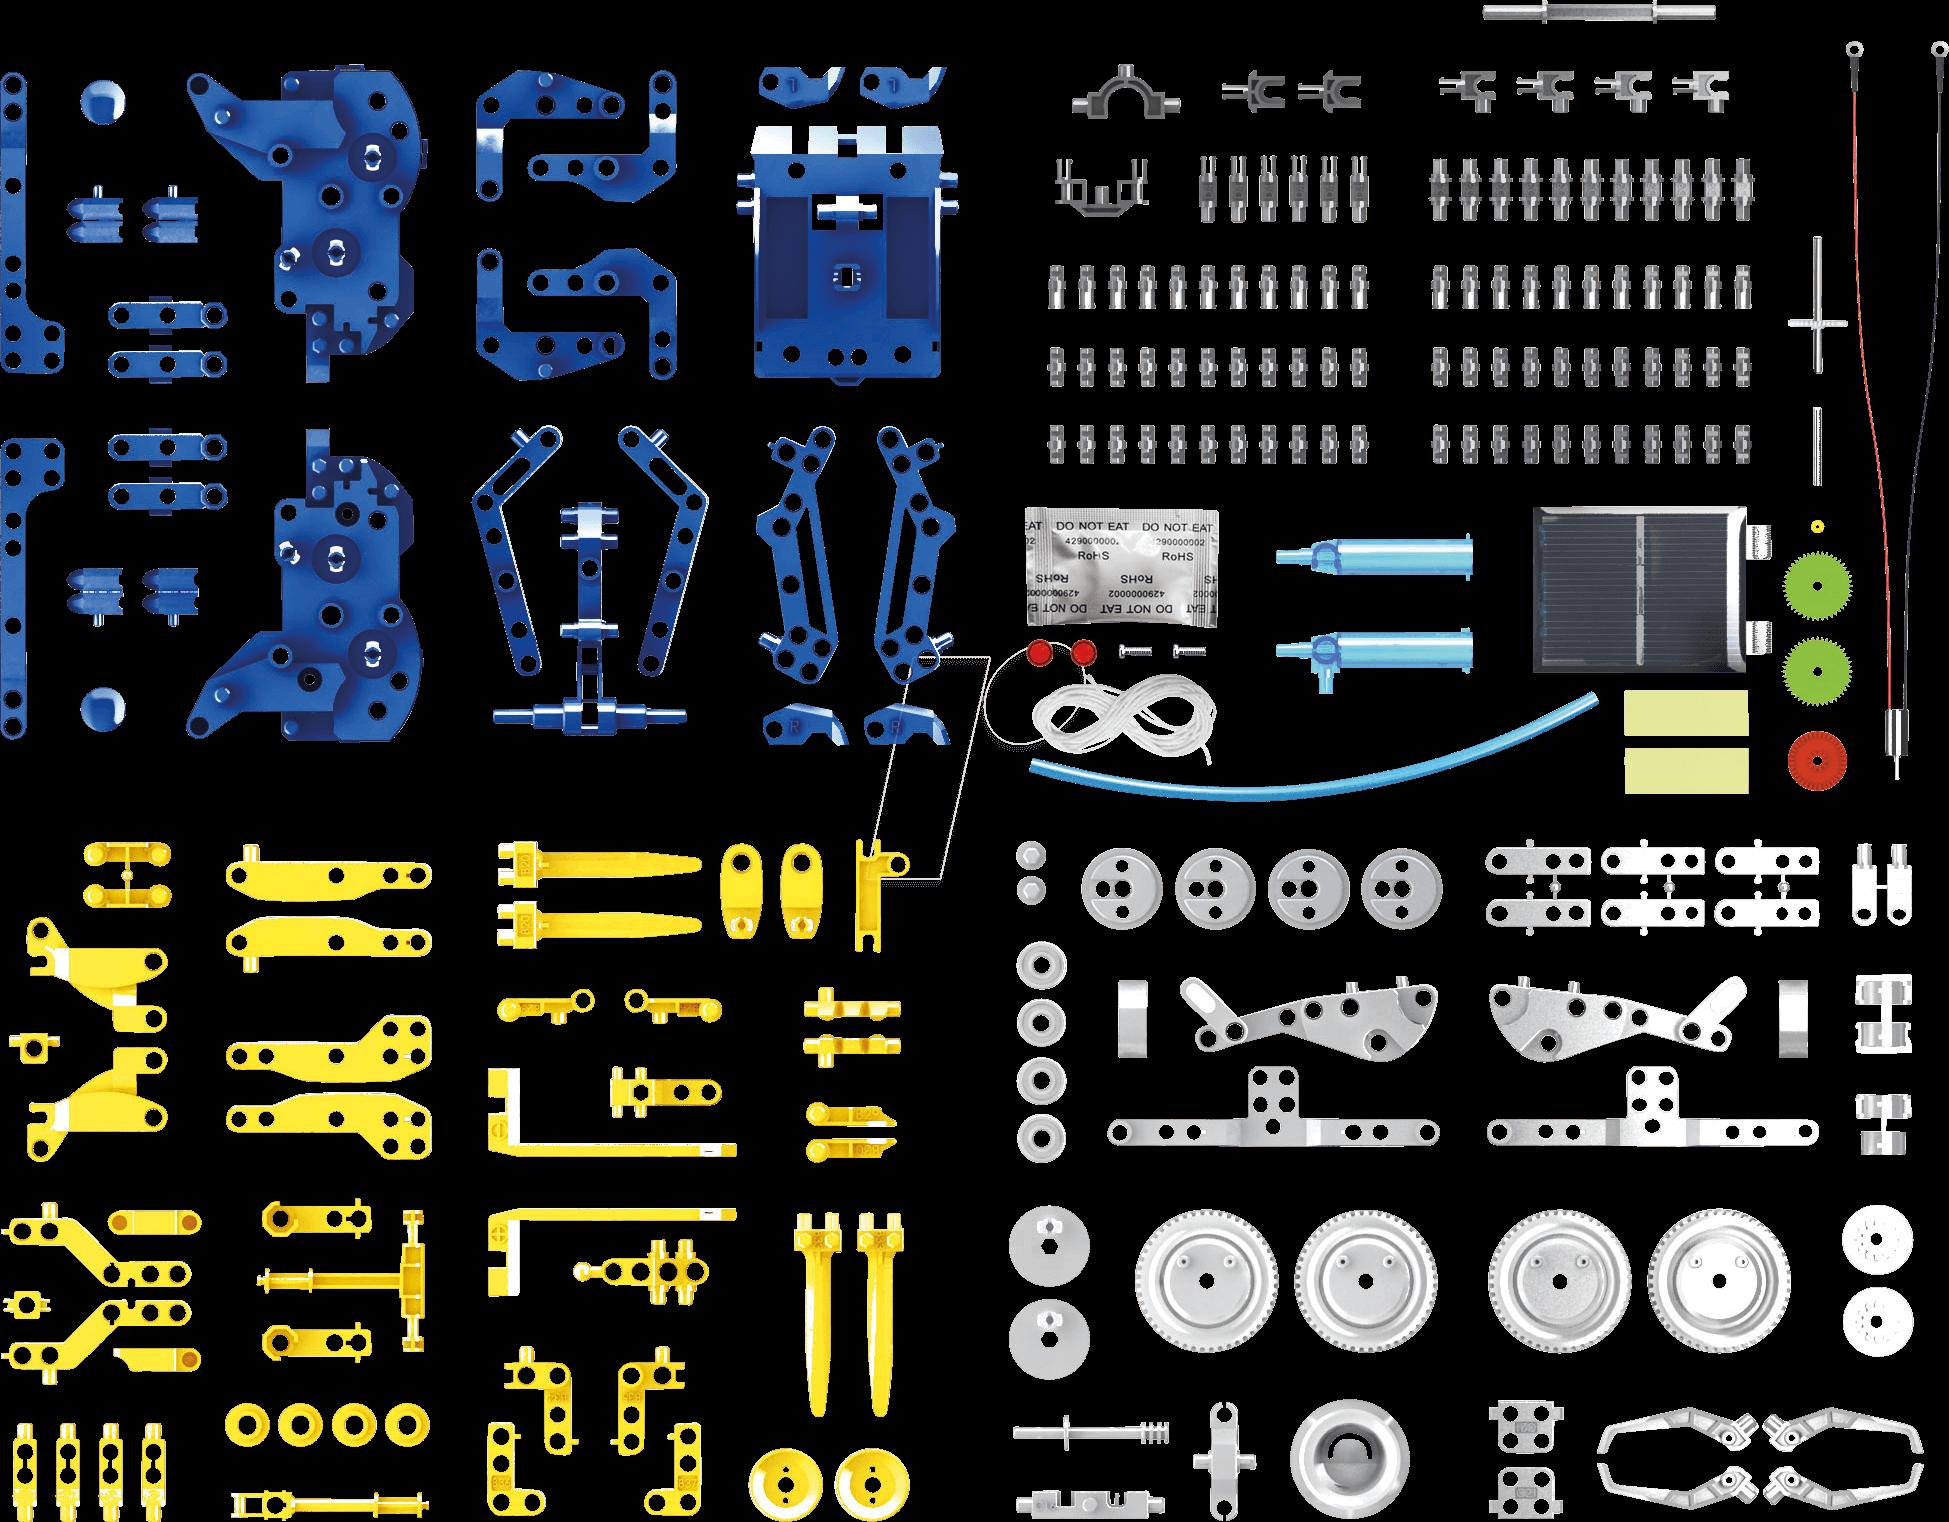 9-in-9 kit, solar kit for 9 models